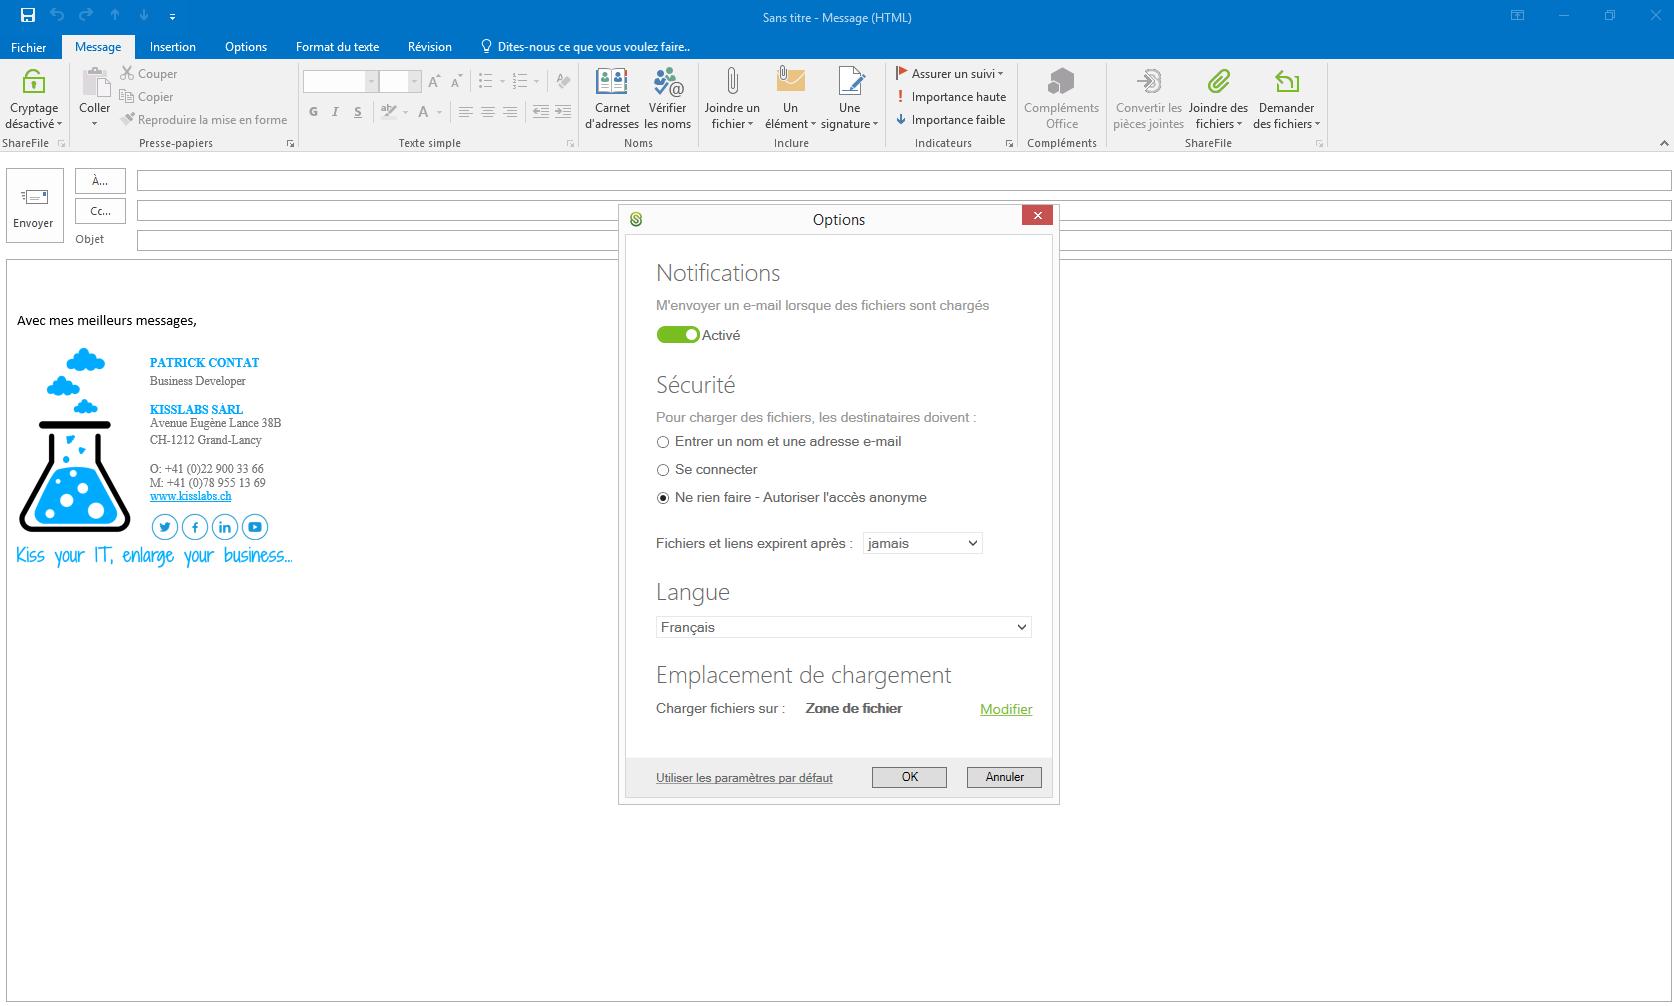 KissFile - Citrix ShareFile - Request files via Outlook settings